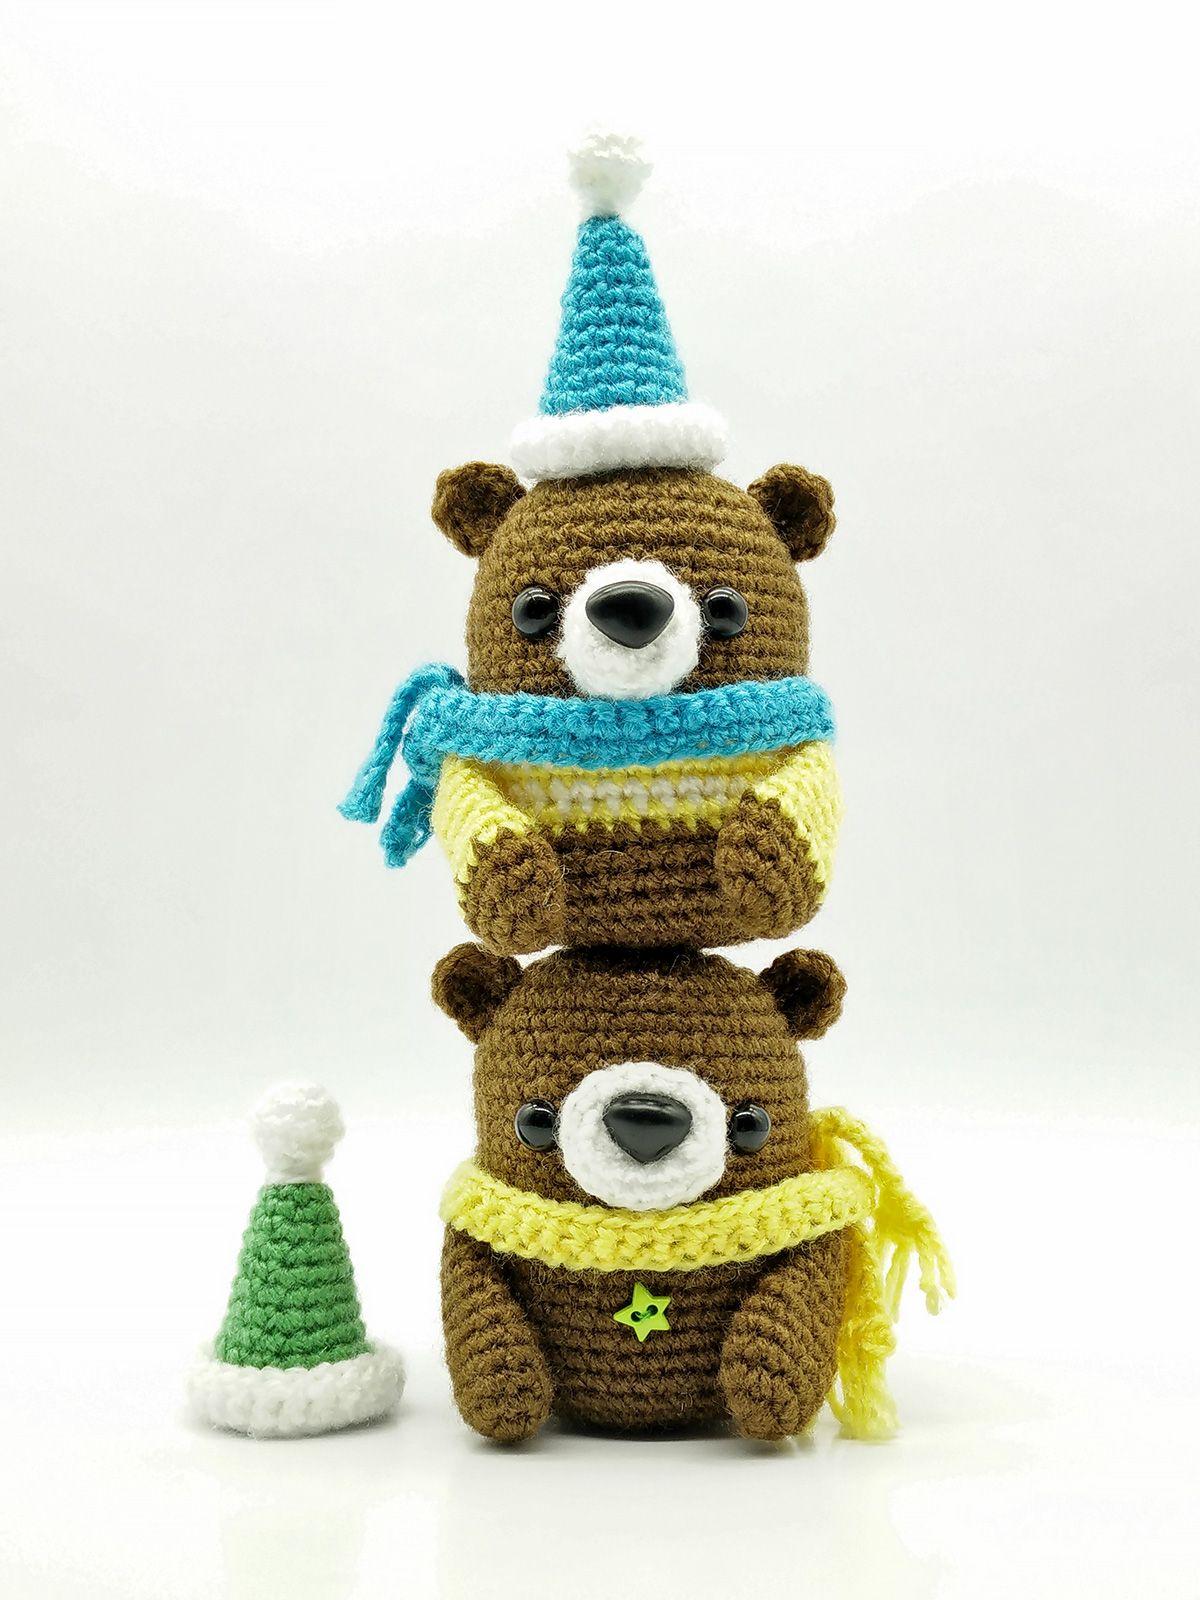 Lazy Bears | Häkelmuster, Häckeln und Häkeln